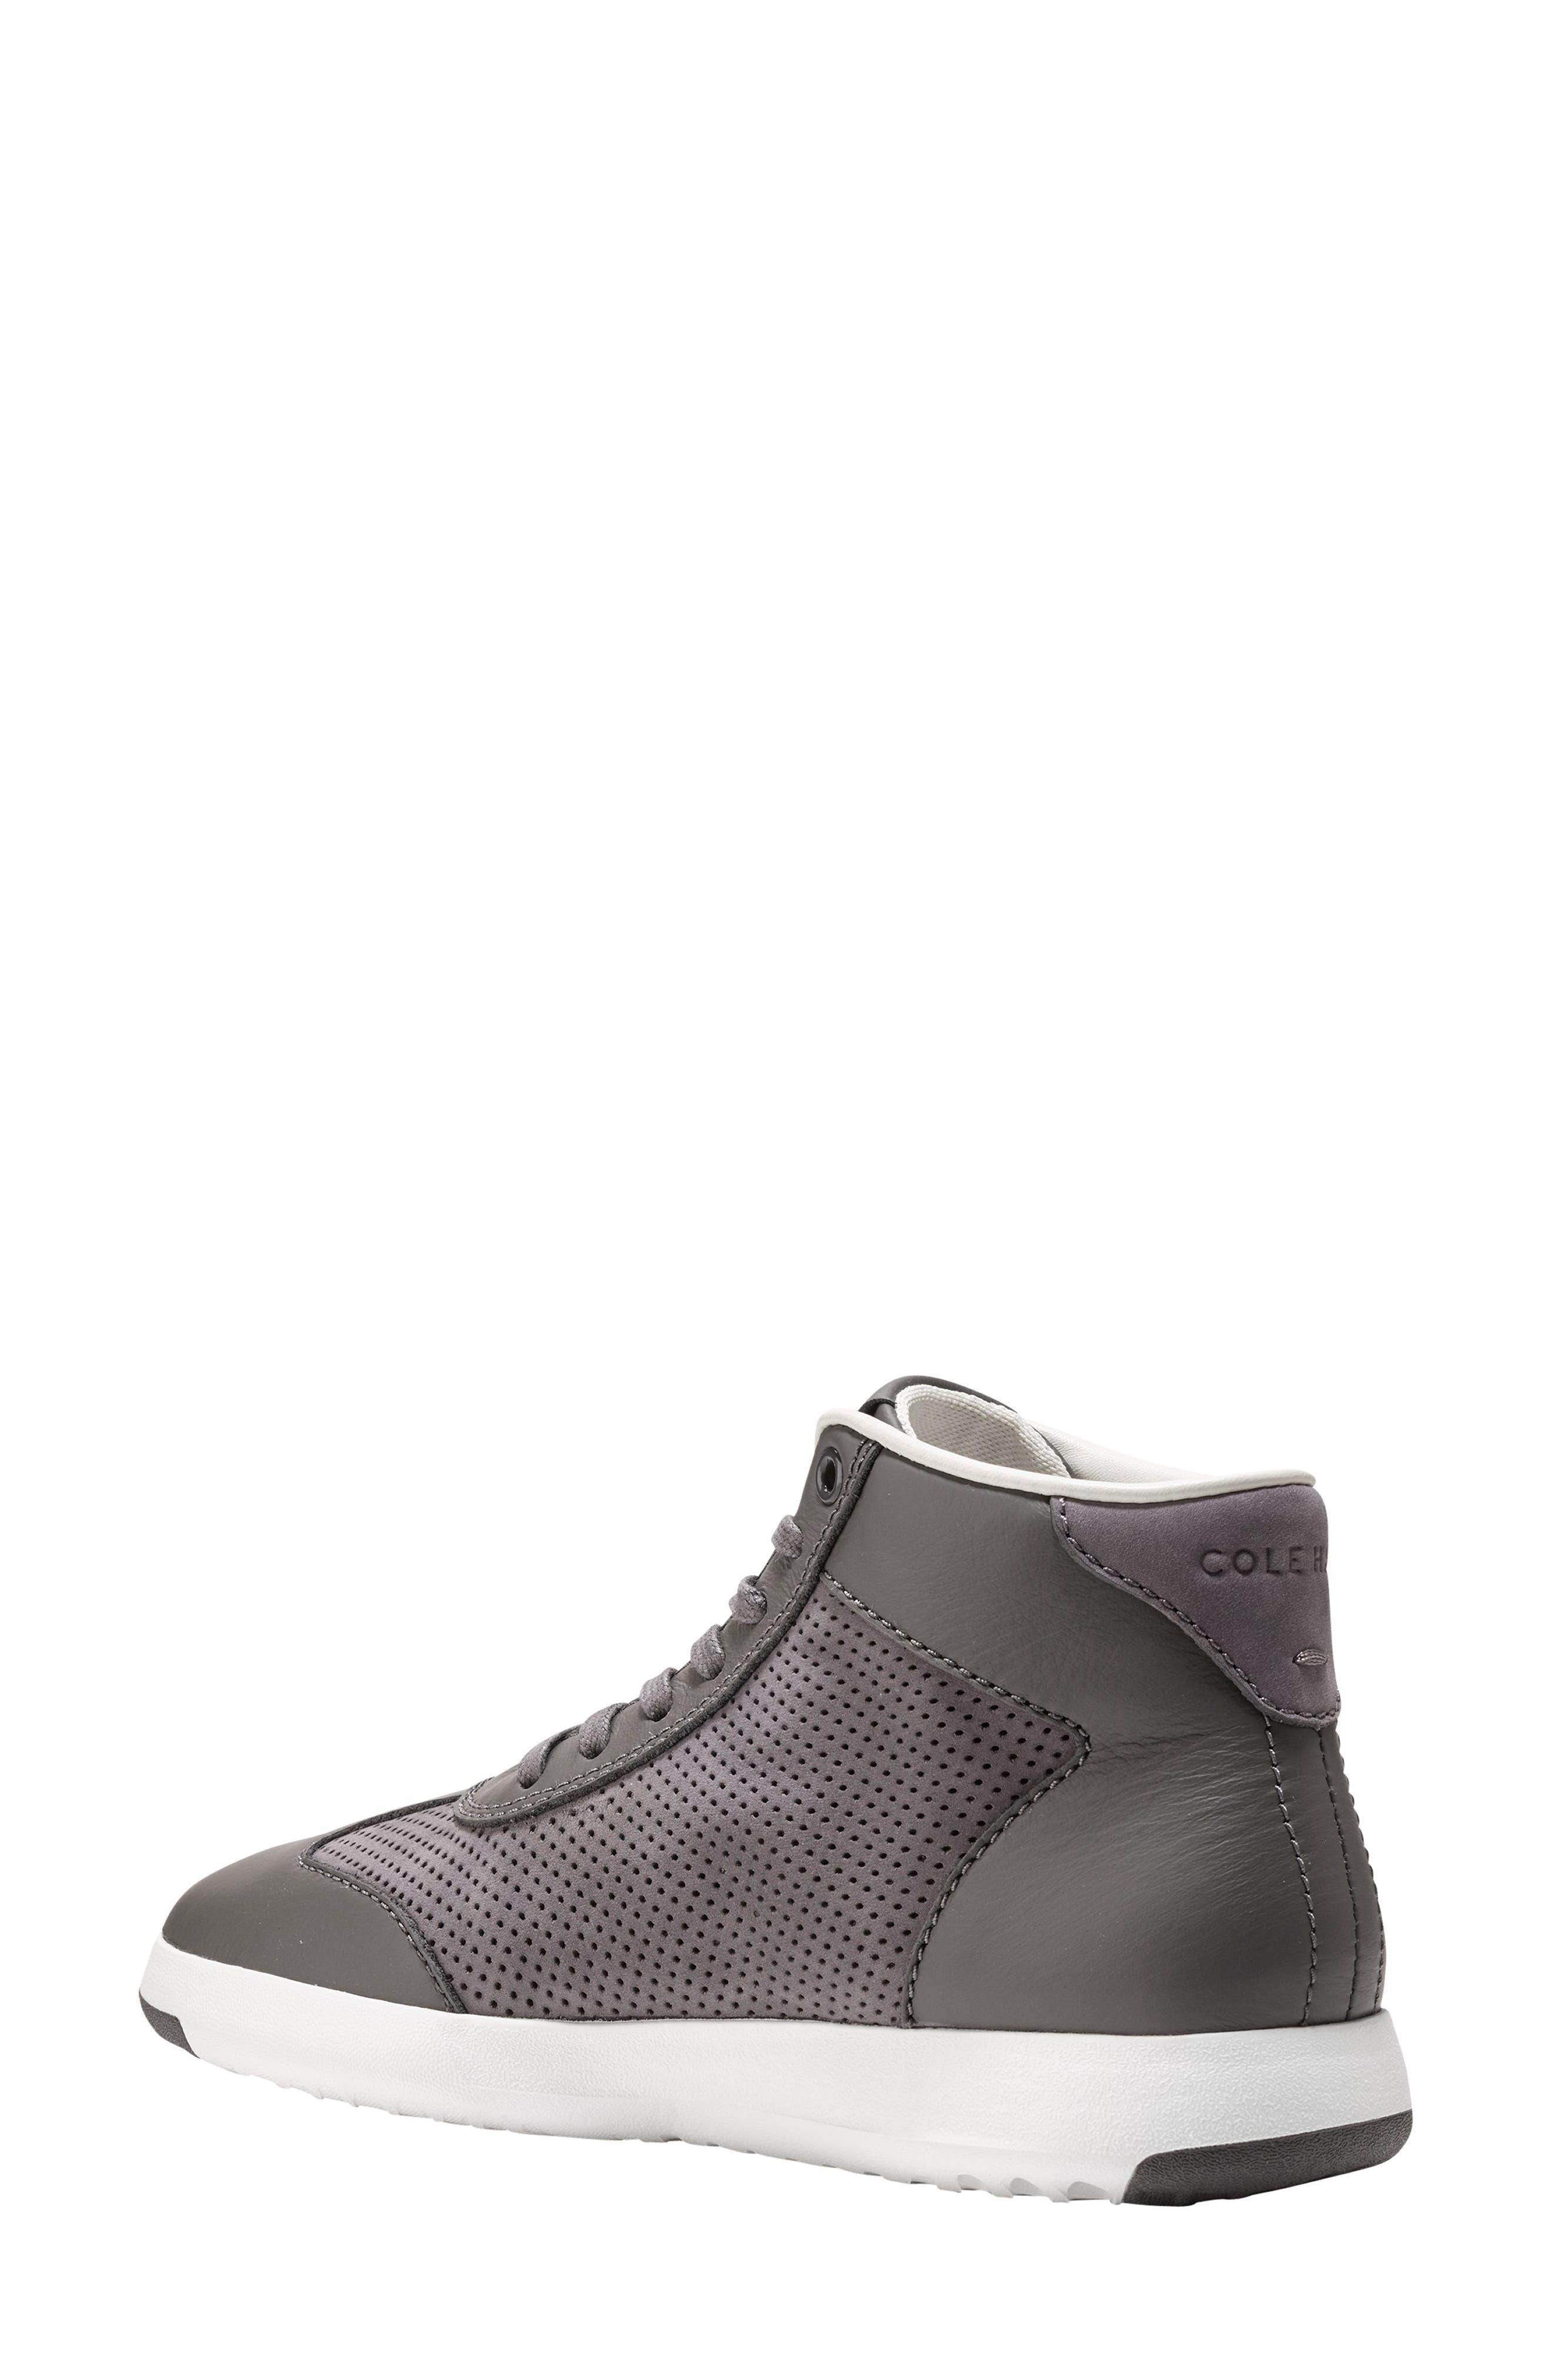 GrandPro High Top Sneaker,                             Alternate thumbnail 2, color,                             025